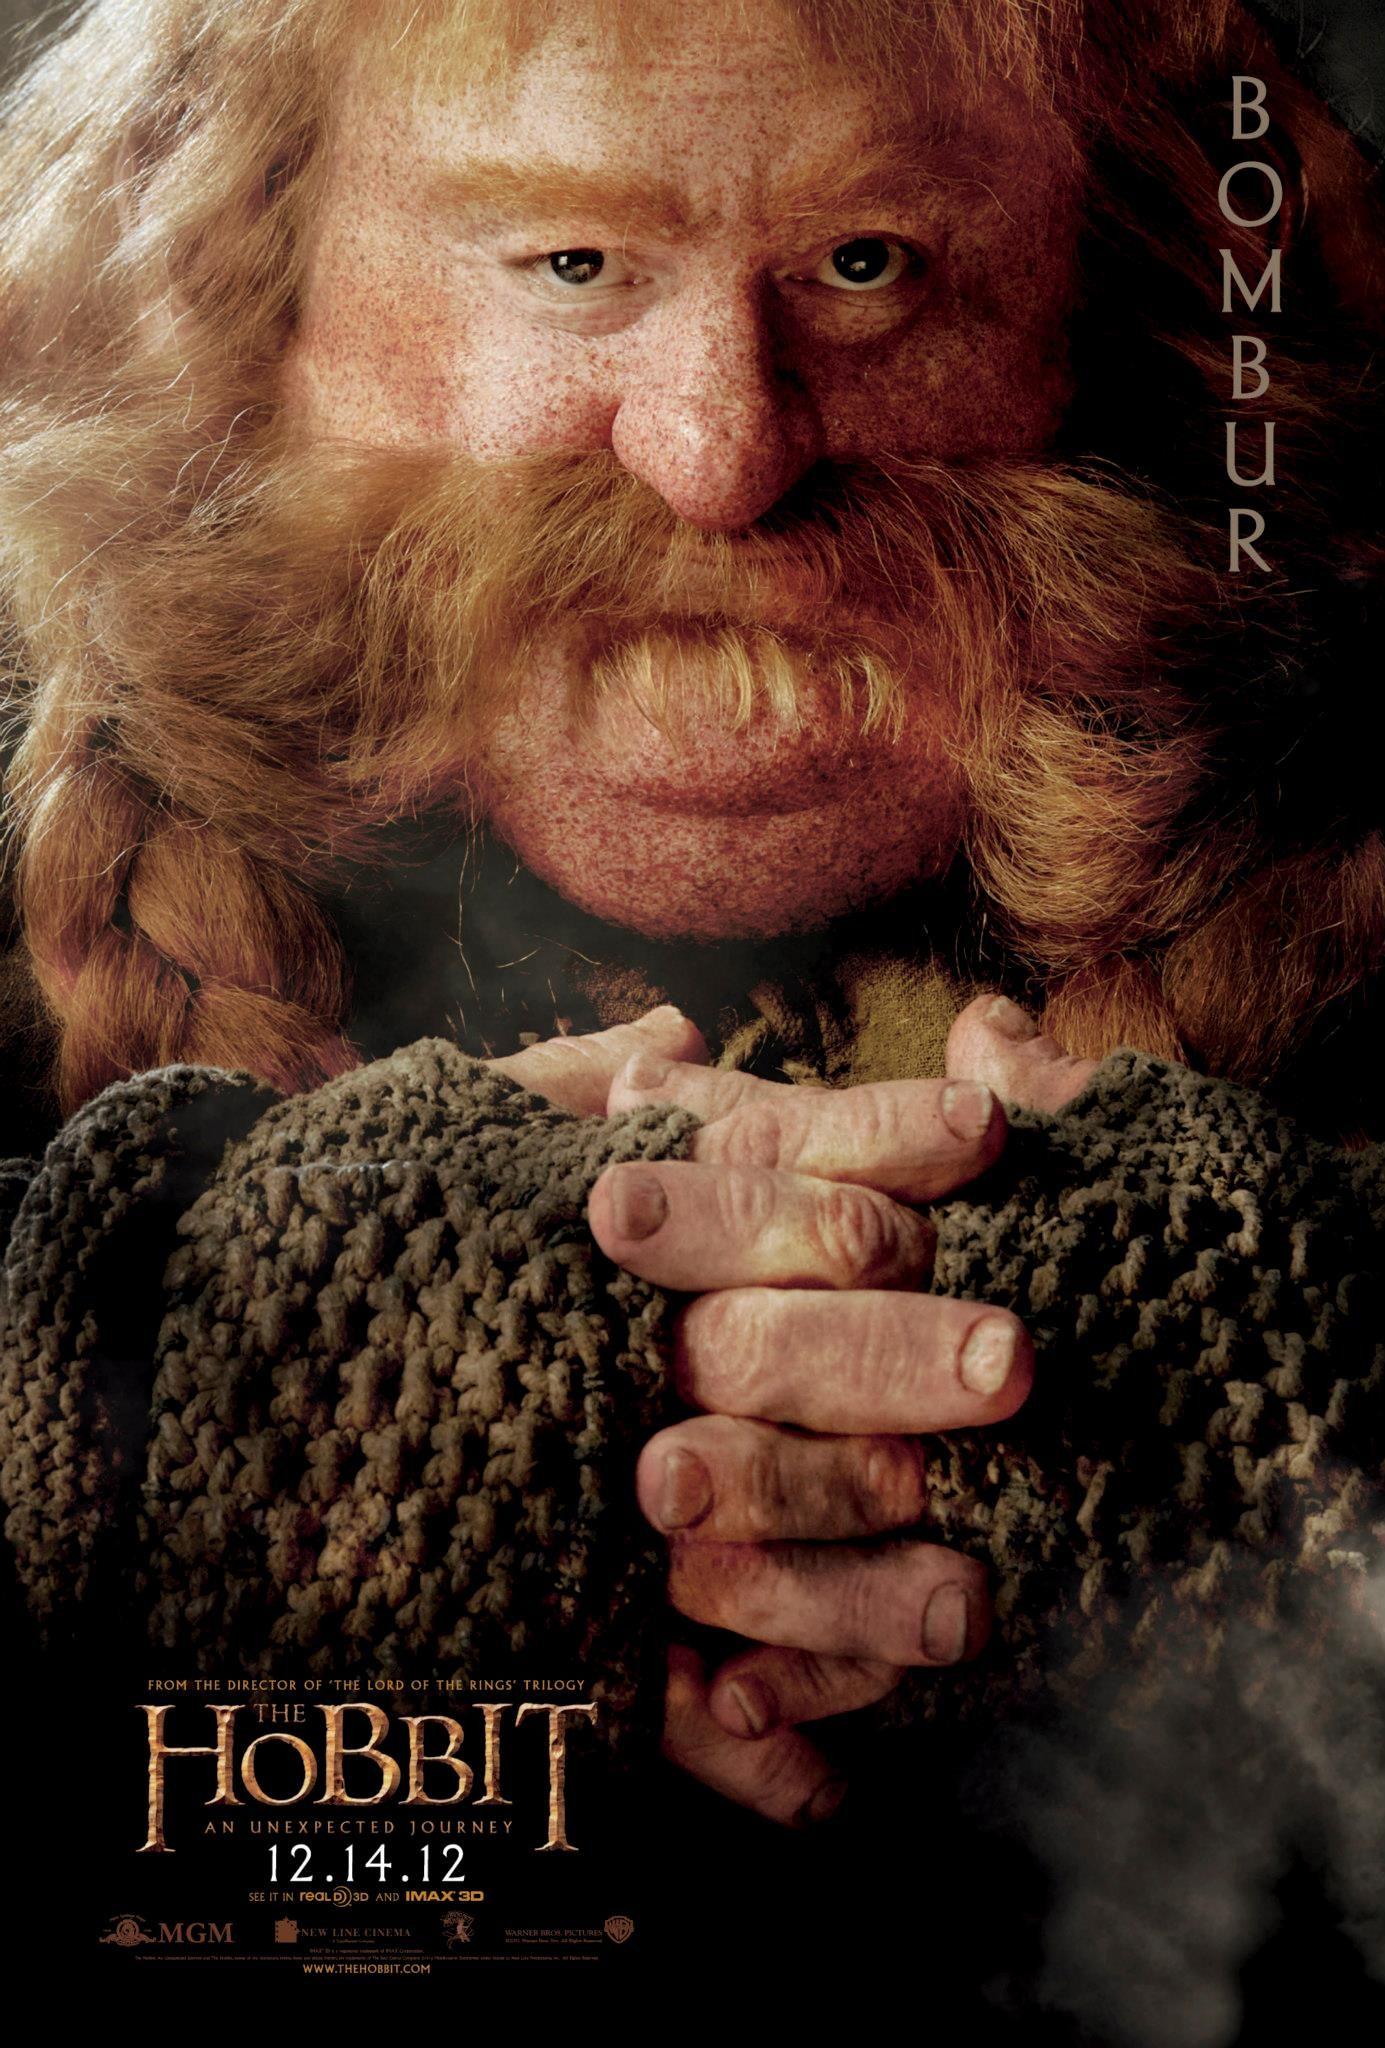 #Hobbit An Unexpected Journey